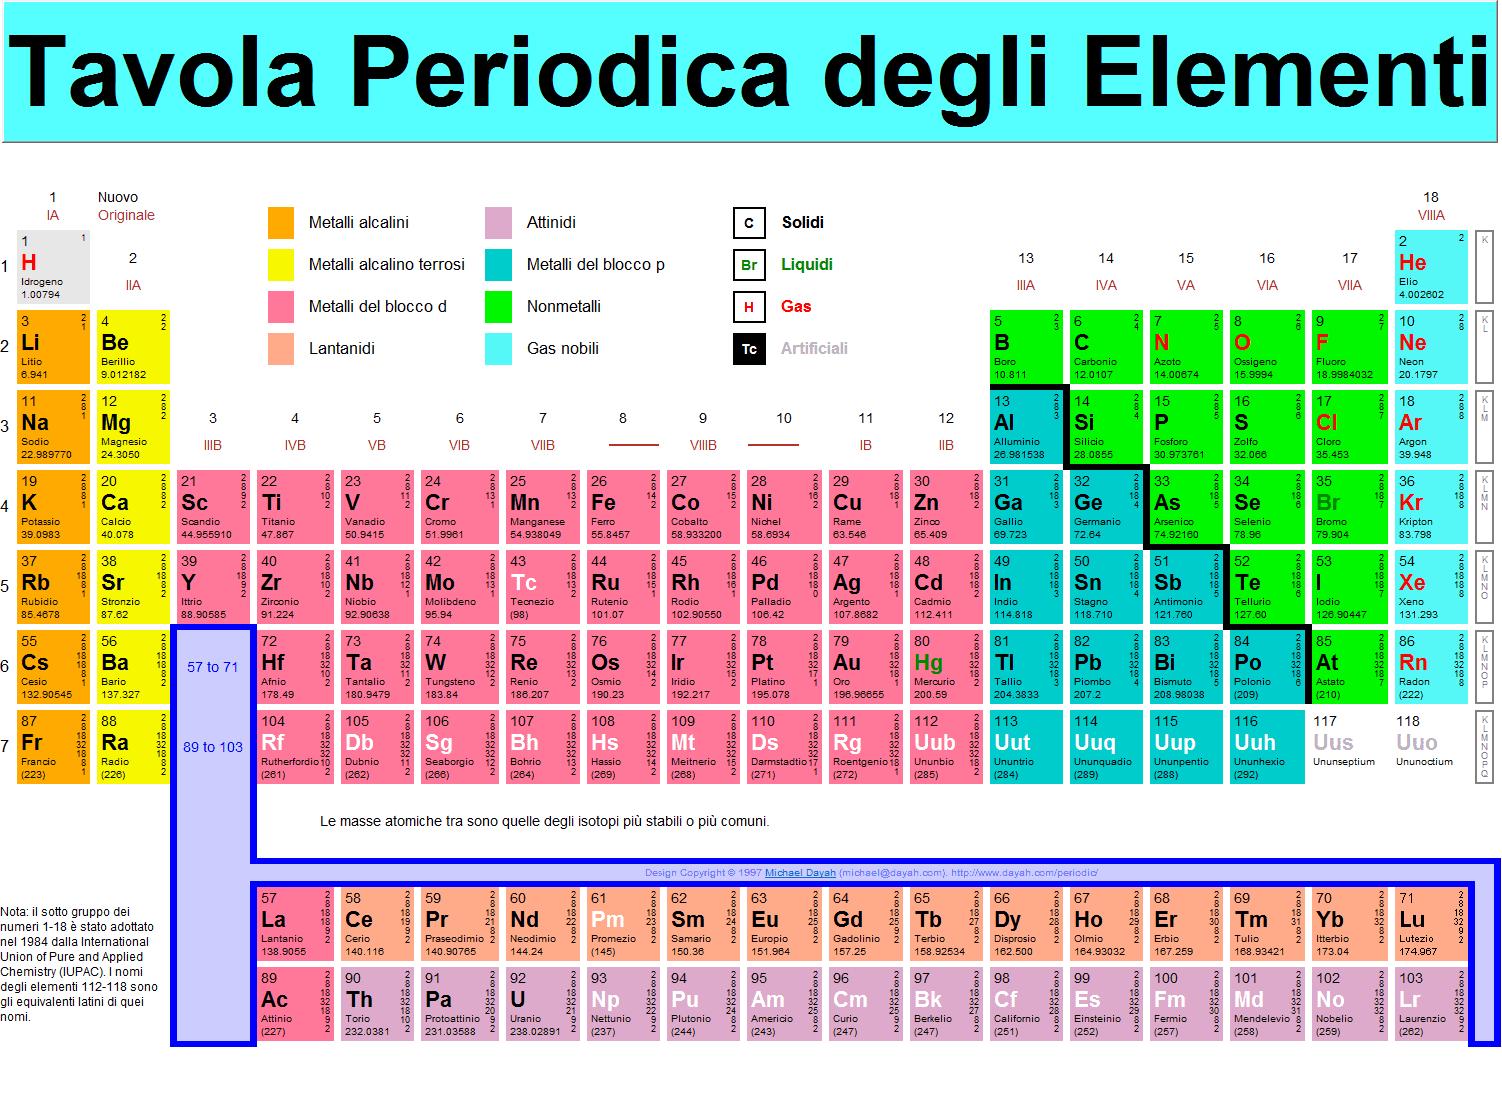 The chemistry of elements tavola periodica degli elementi - Tavola periodica degli elementi spiegazione semplice ...